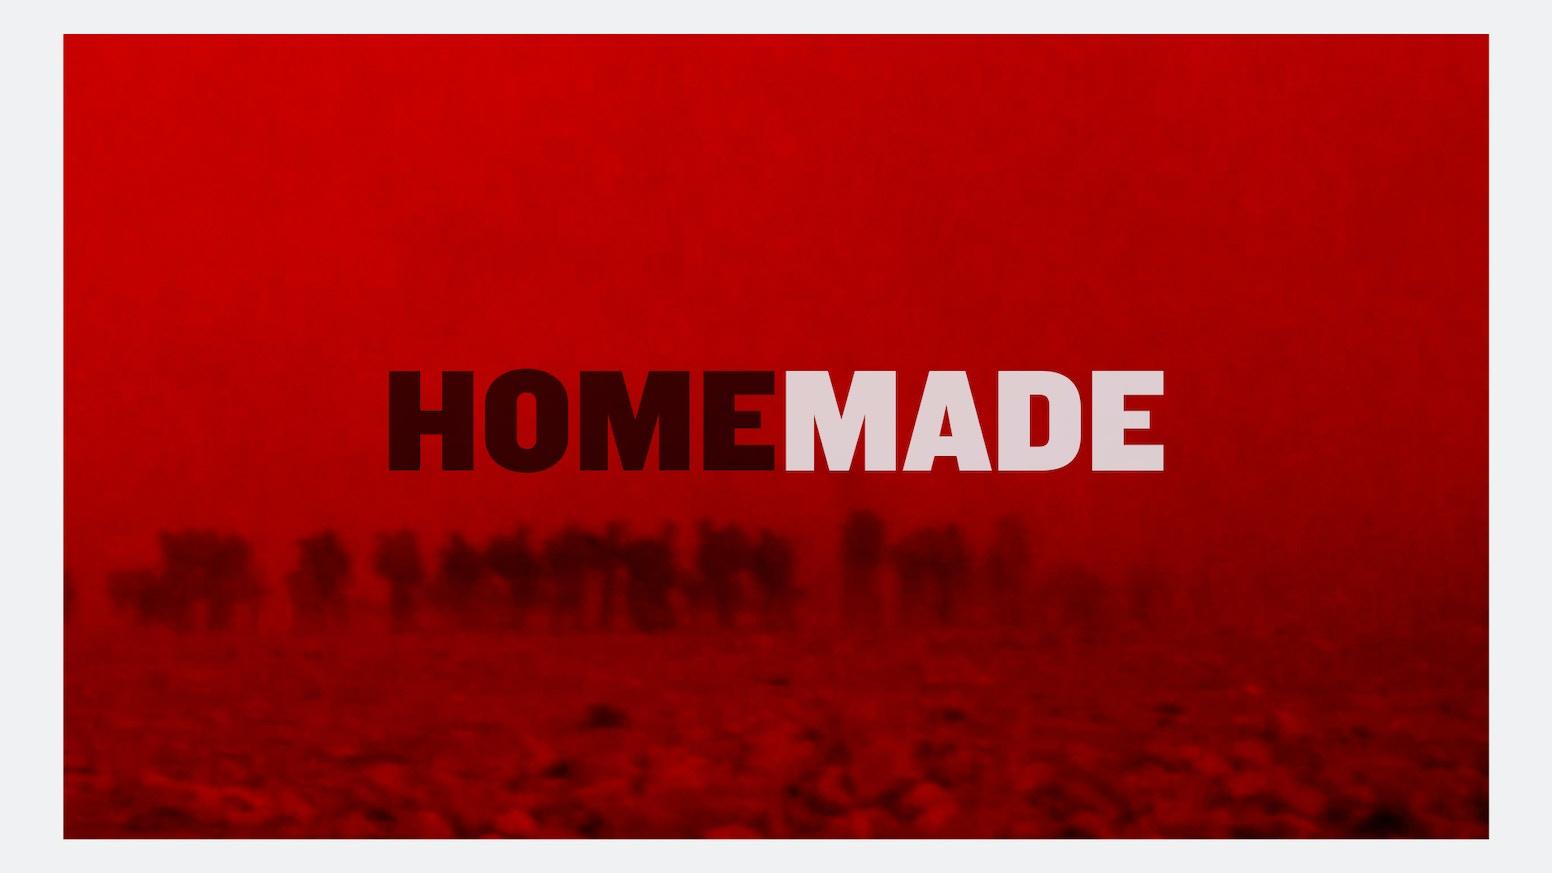 Homemade By Danielle Bernstein Jason Maris Memorial Day Weekend